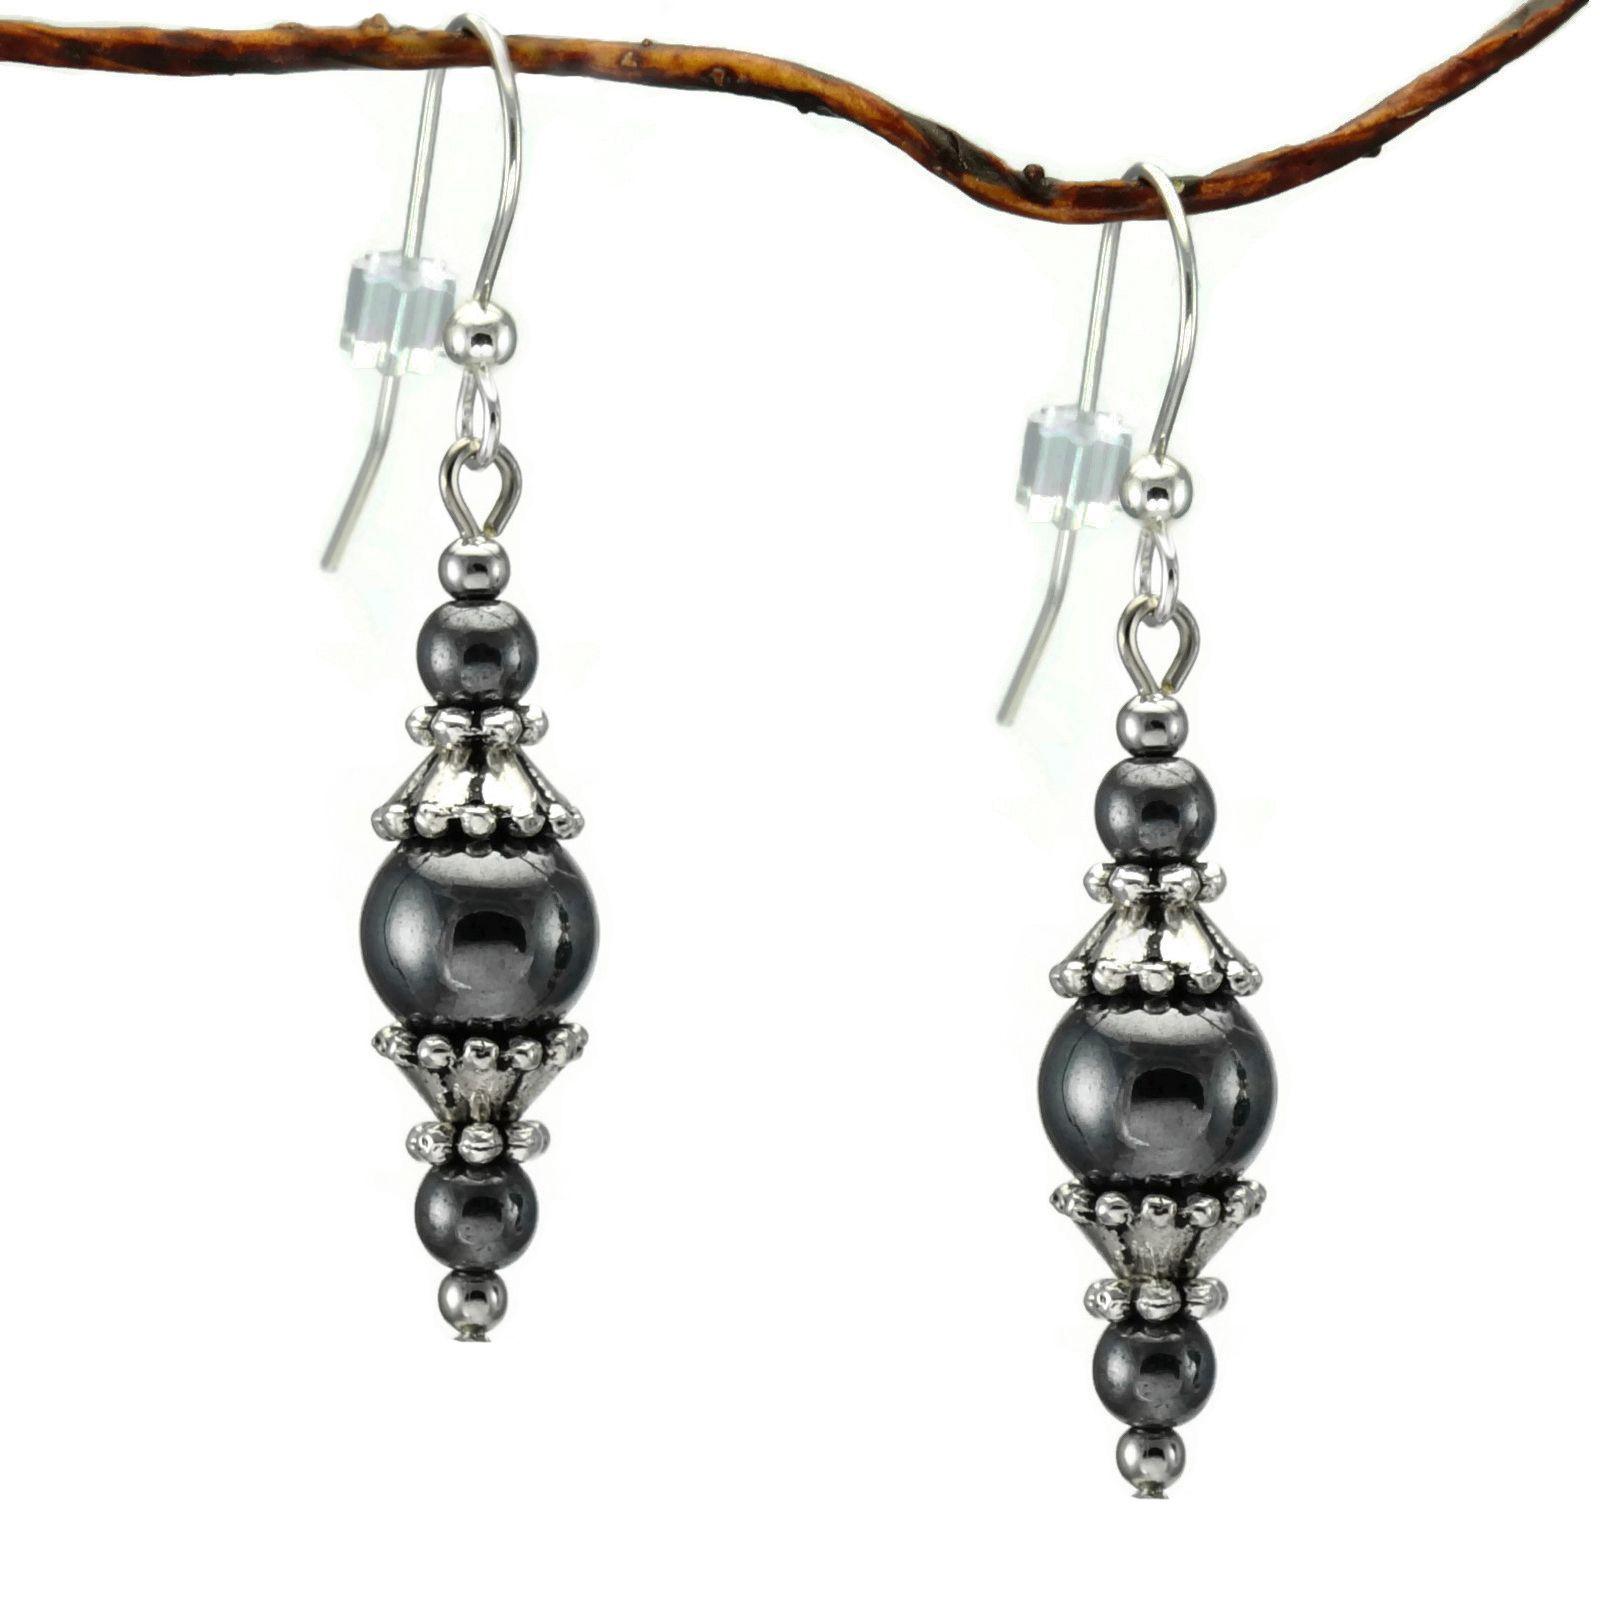 Handmade Jewelry By Dawn Round Hematite With Pewter